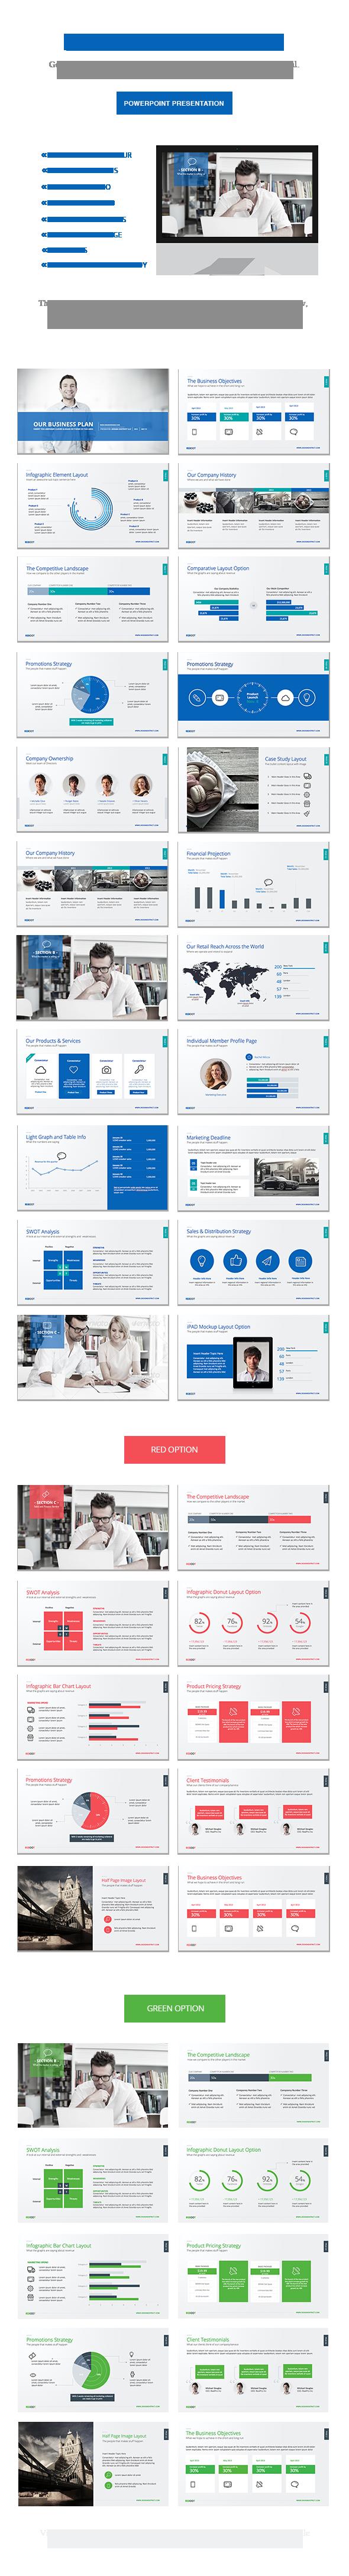 business plan powerpoint on behance